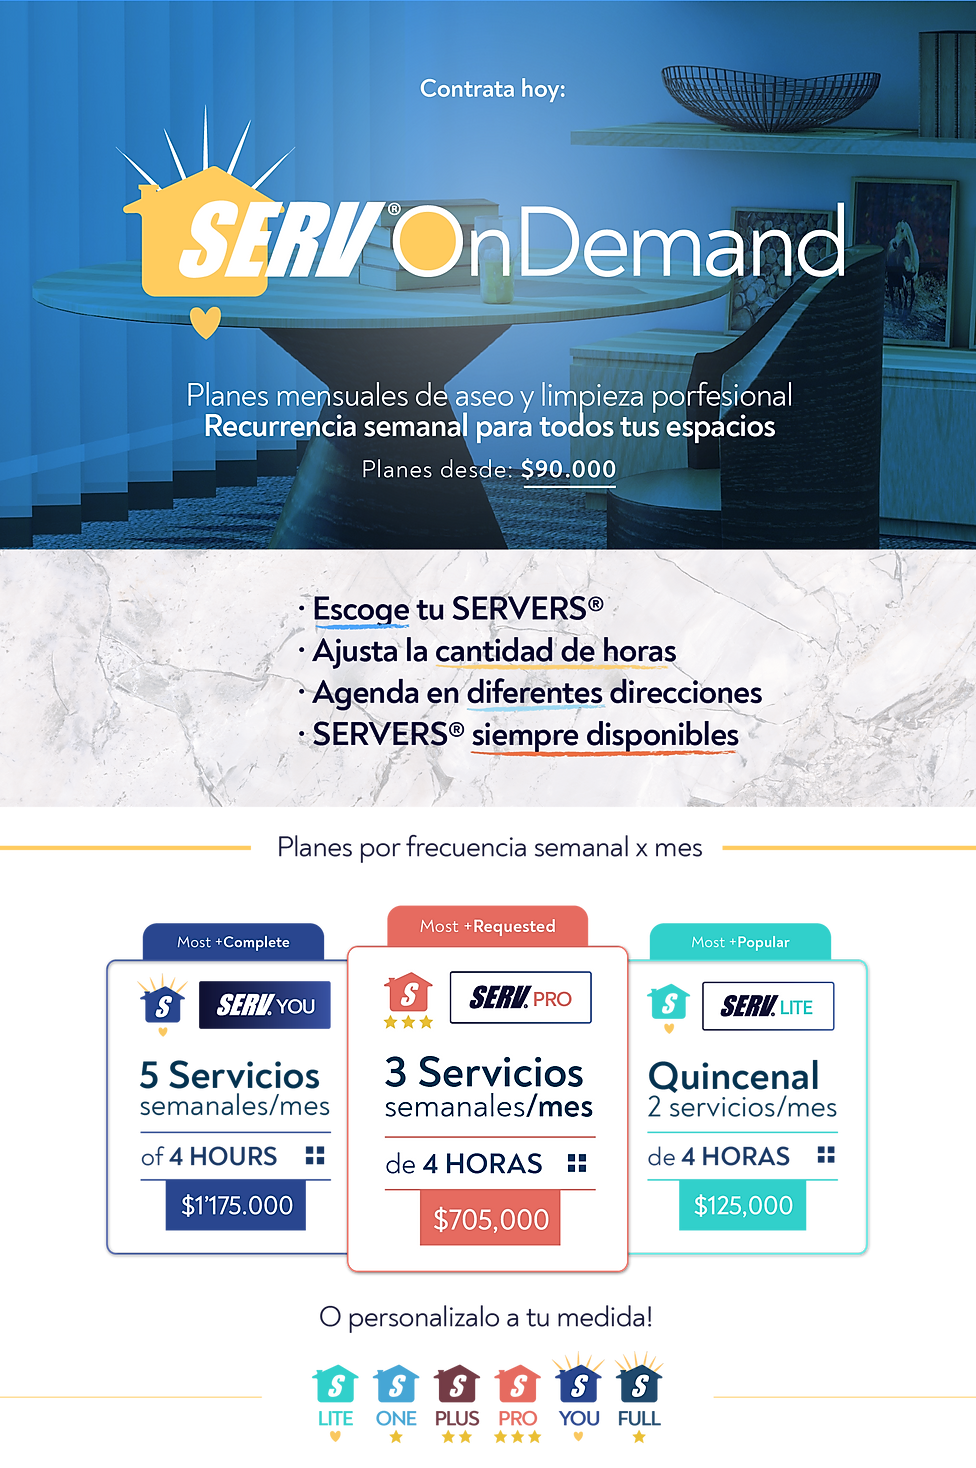 Planes_Srvondemand_Español-36-36.png